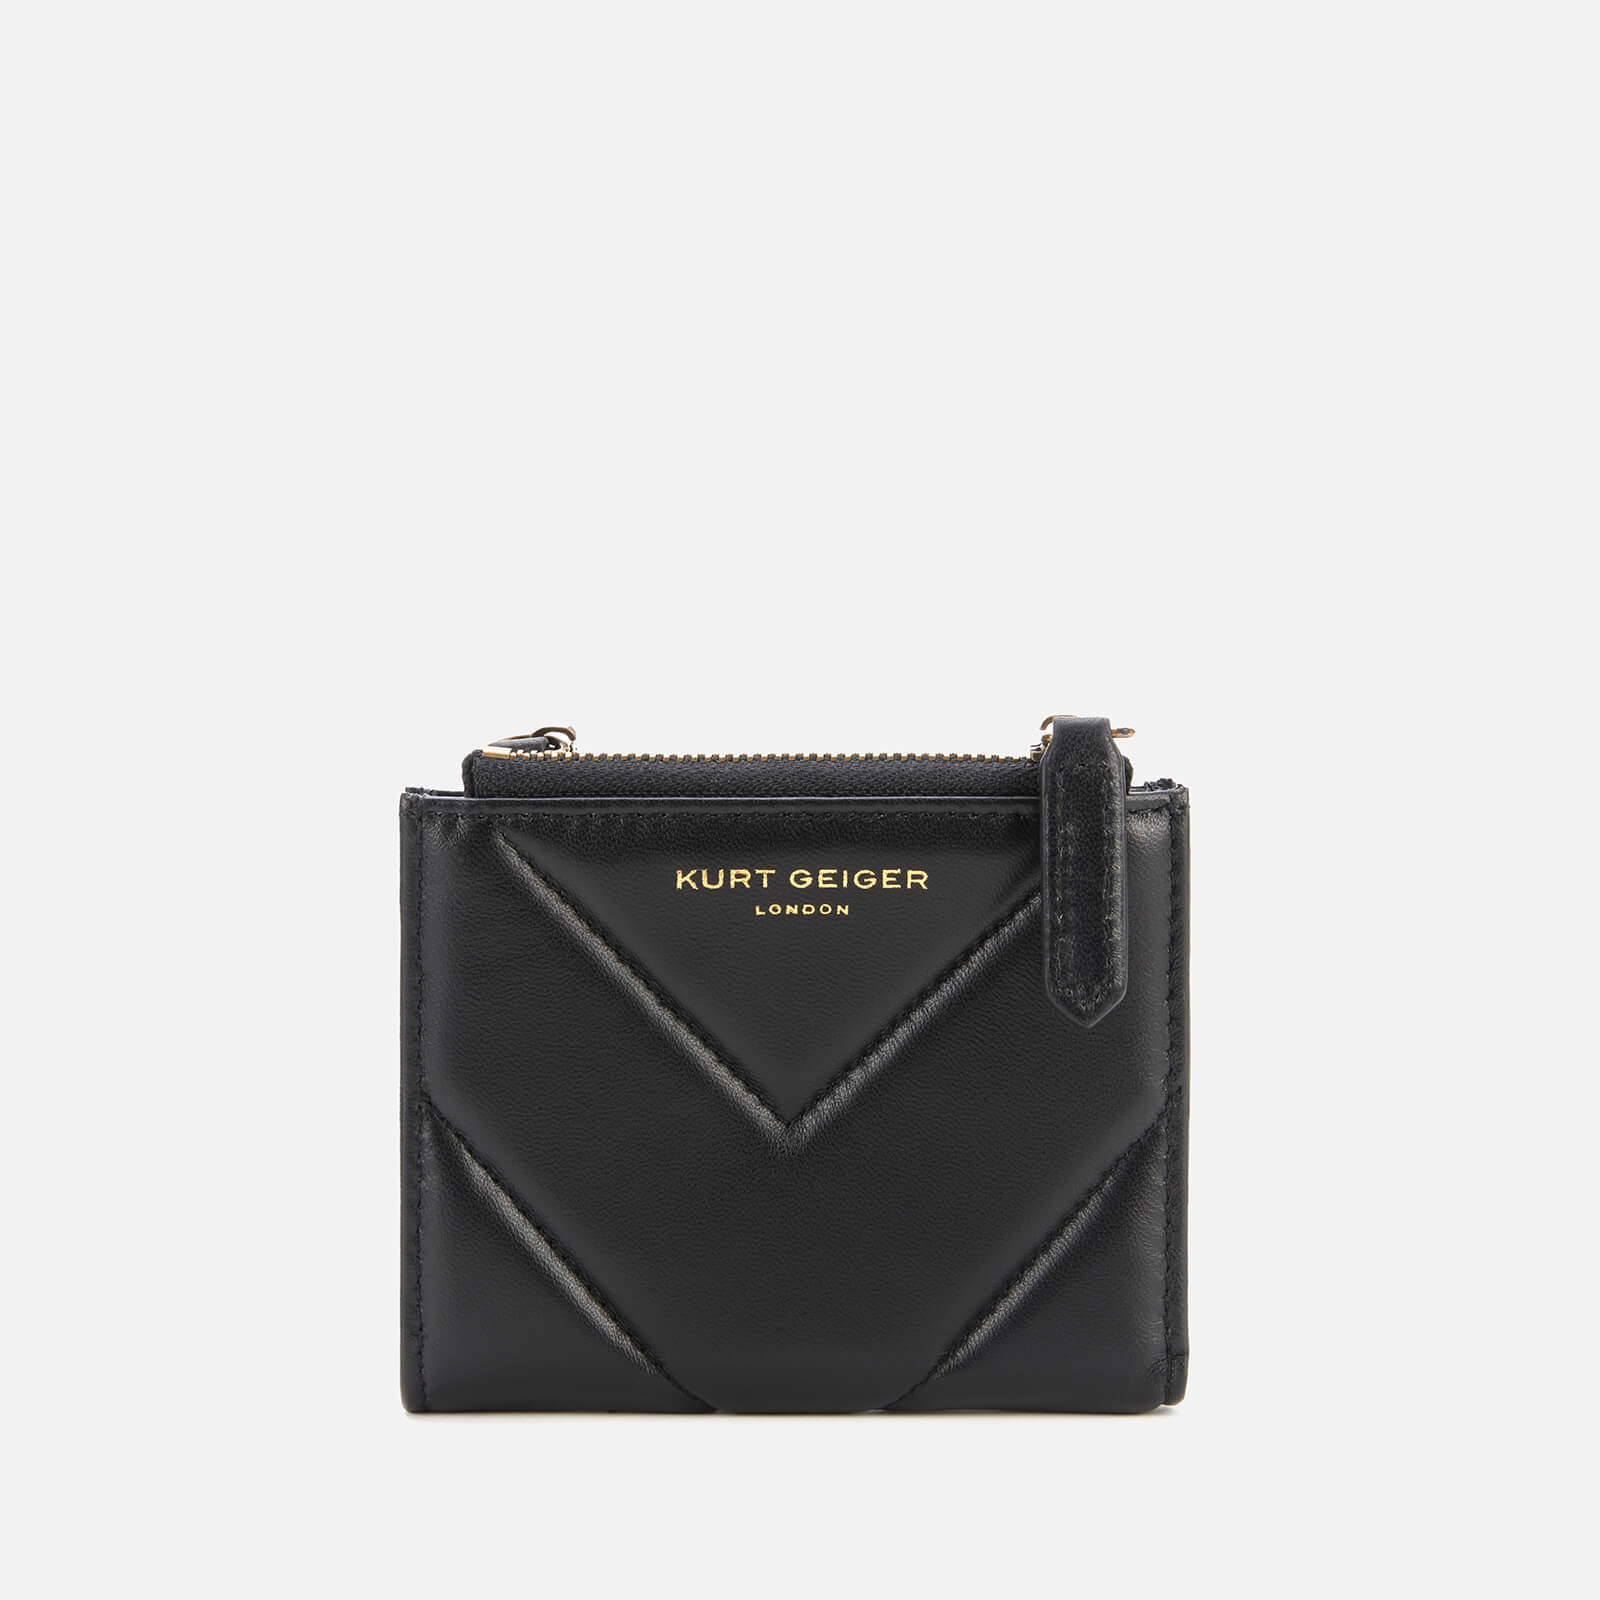 Kurt Geiger London Women's Mini Quilted Purse - Black